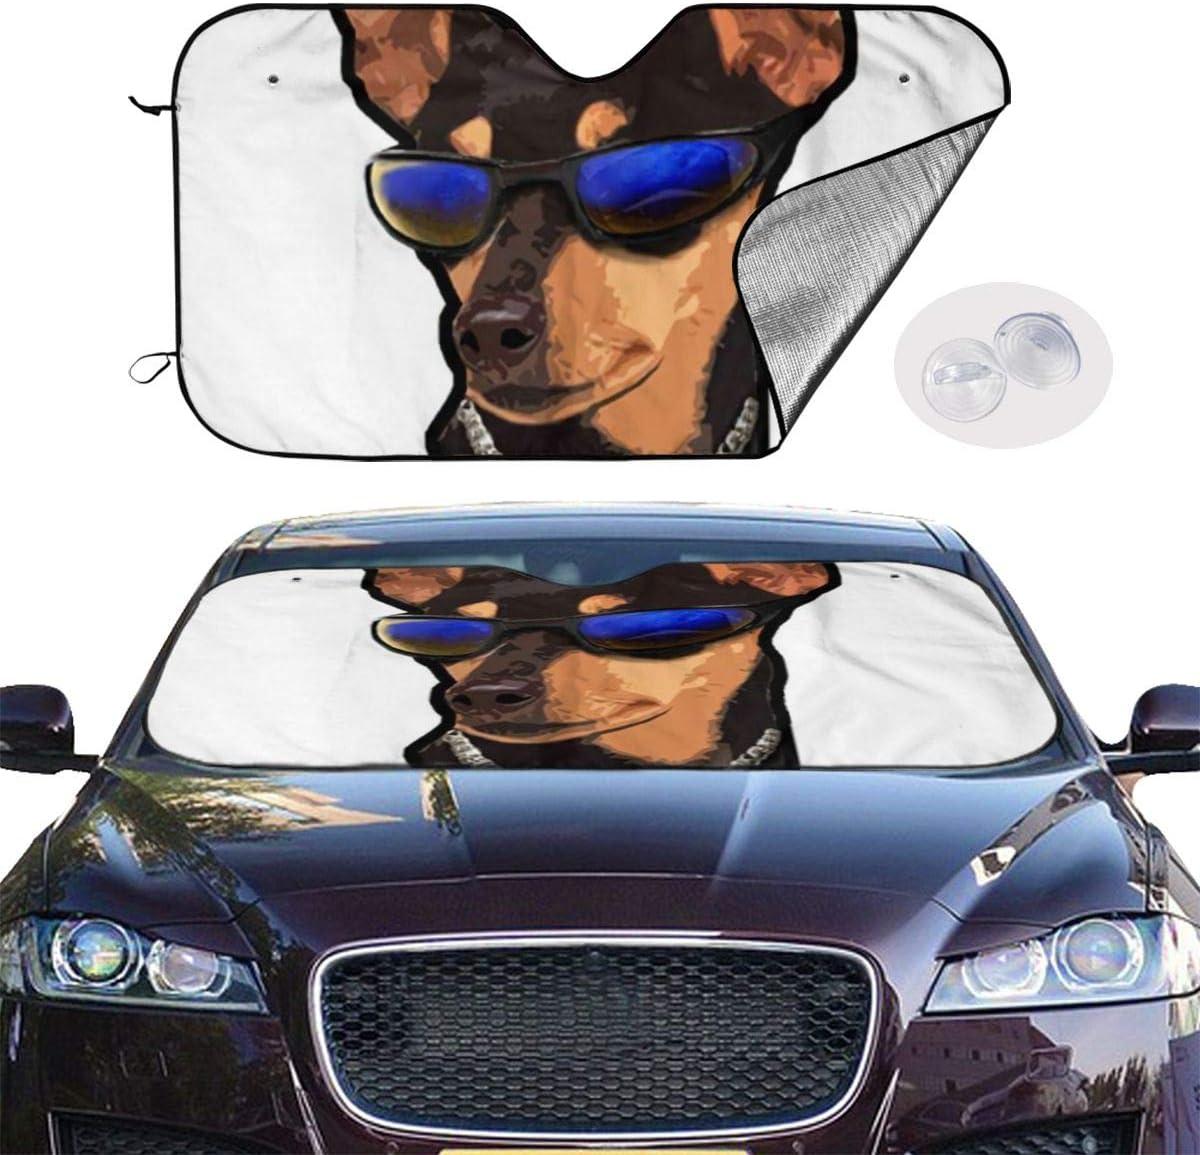 Label Love Long Hair Black Chihuahua Dog Cool FUUNY Windshield Sun Shade Sunshades Keep Vehicle Cool Protect Your Car from Sun Heat /& Glare Best Uv Ray Visor Protector Size 27.5X 51